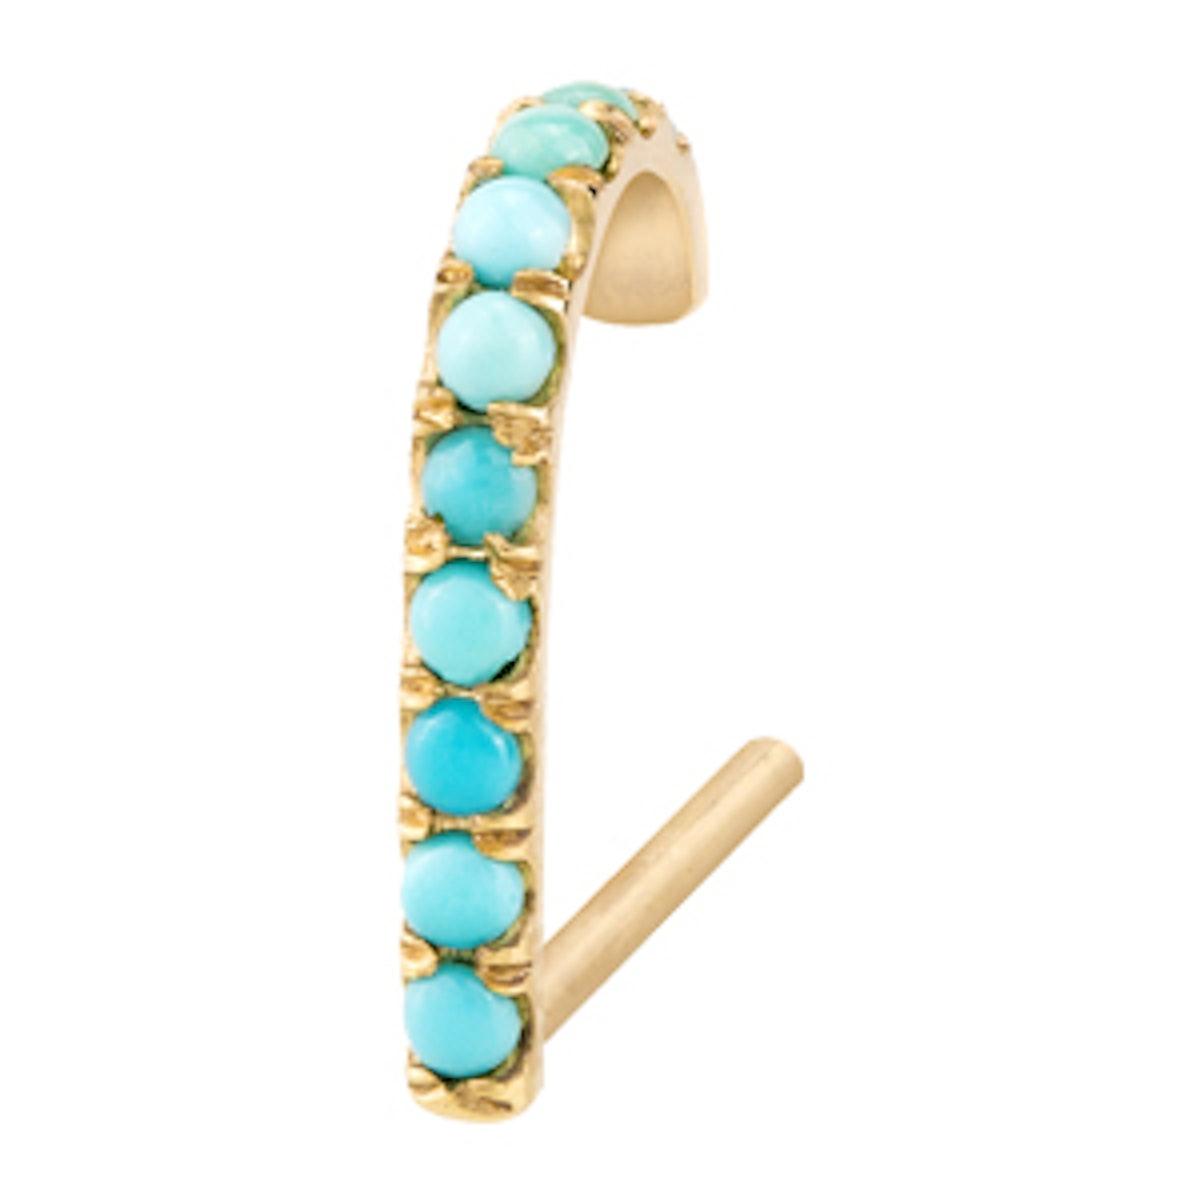 Turquoise Suspender Earring